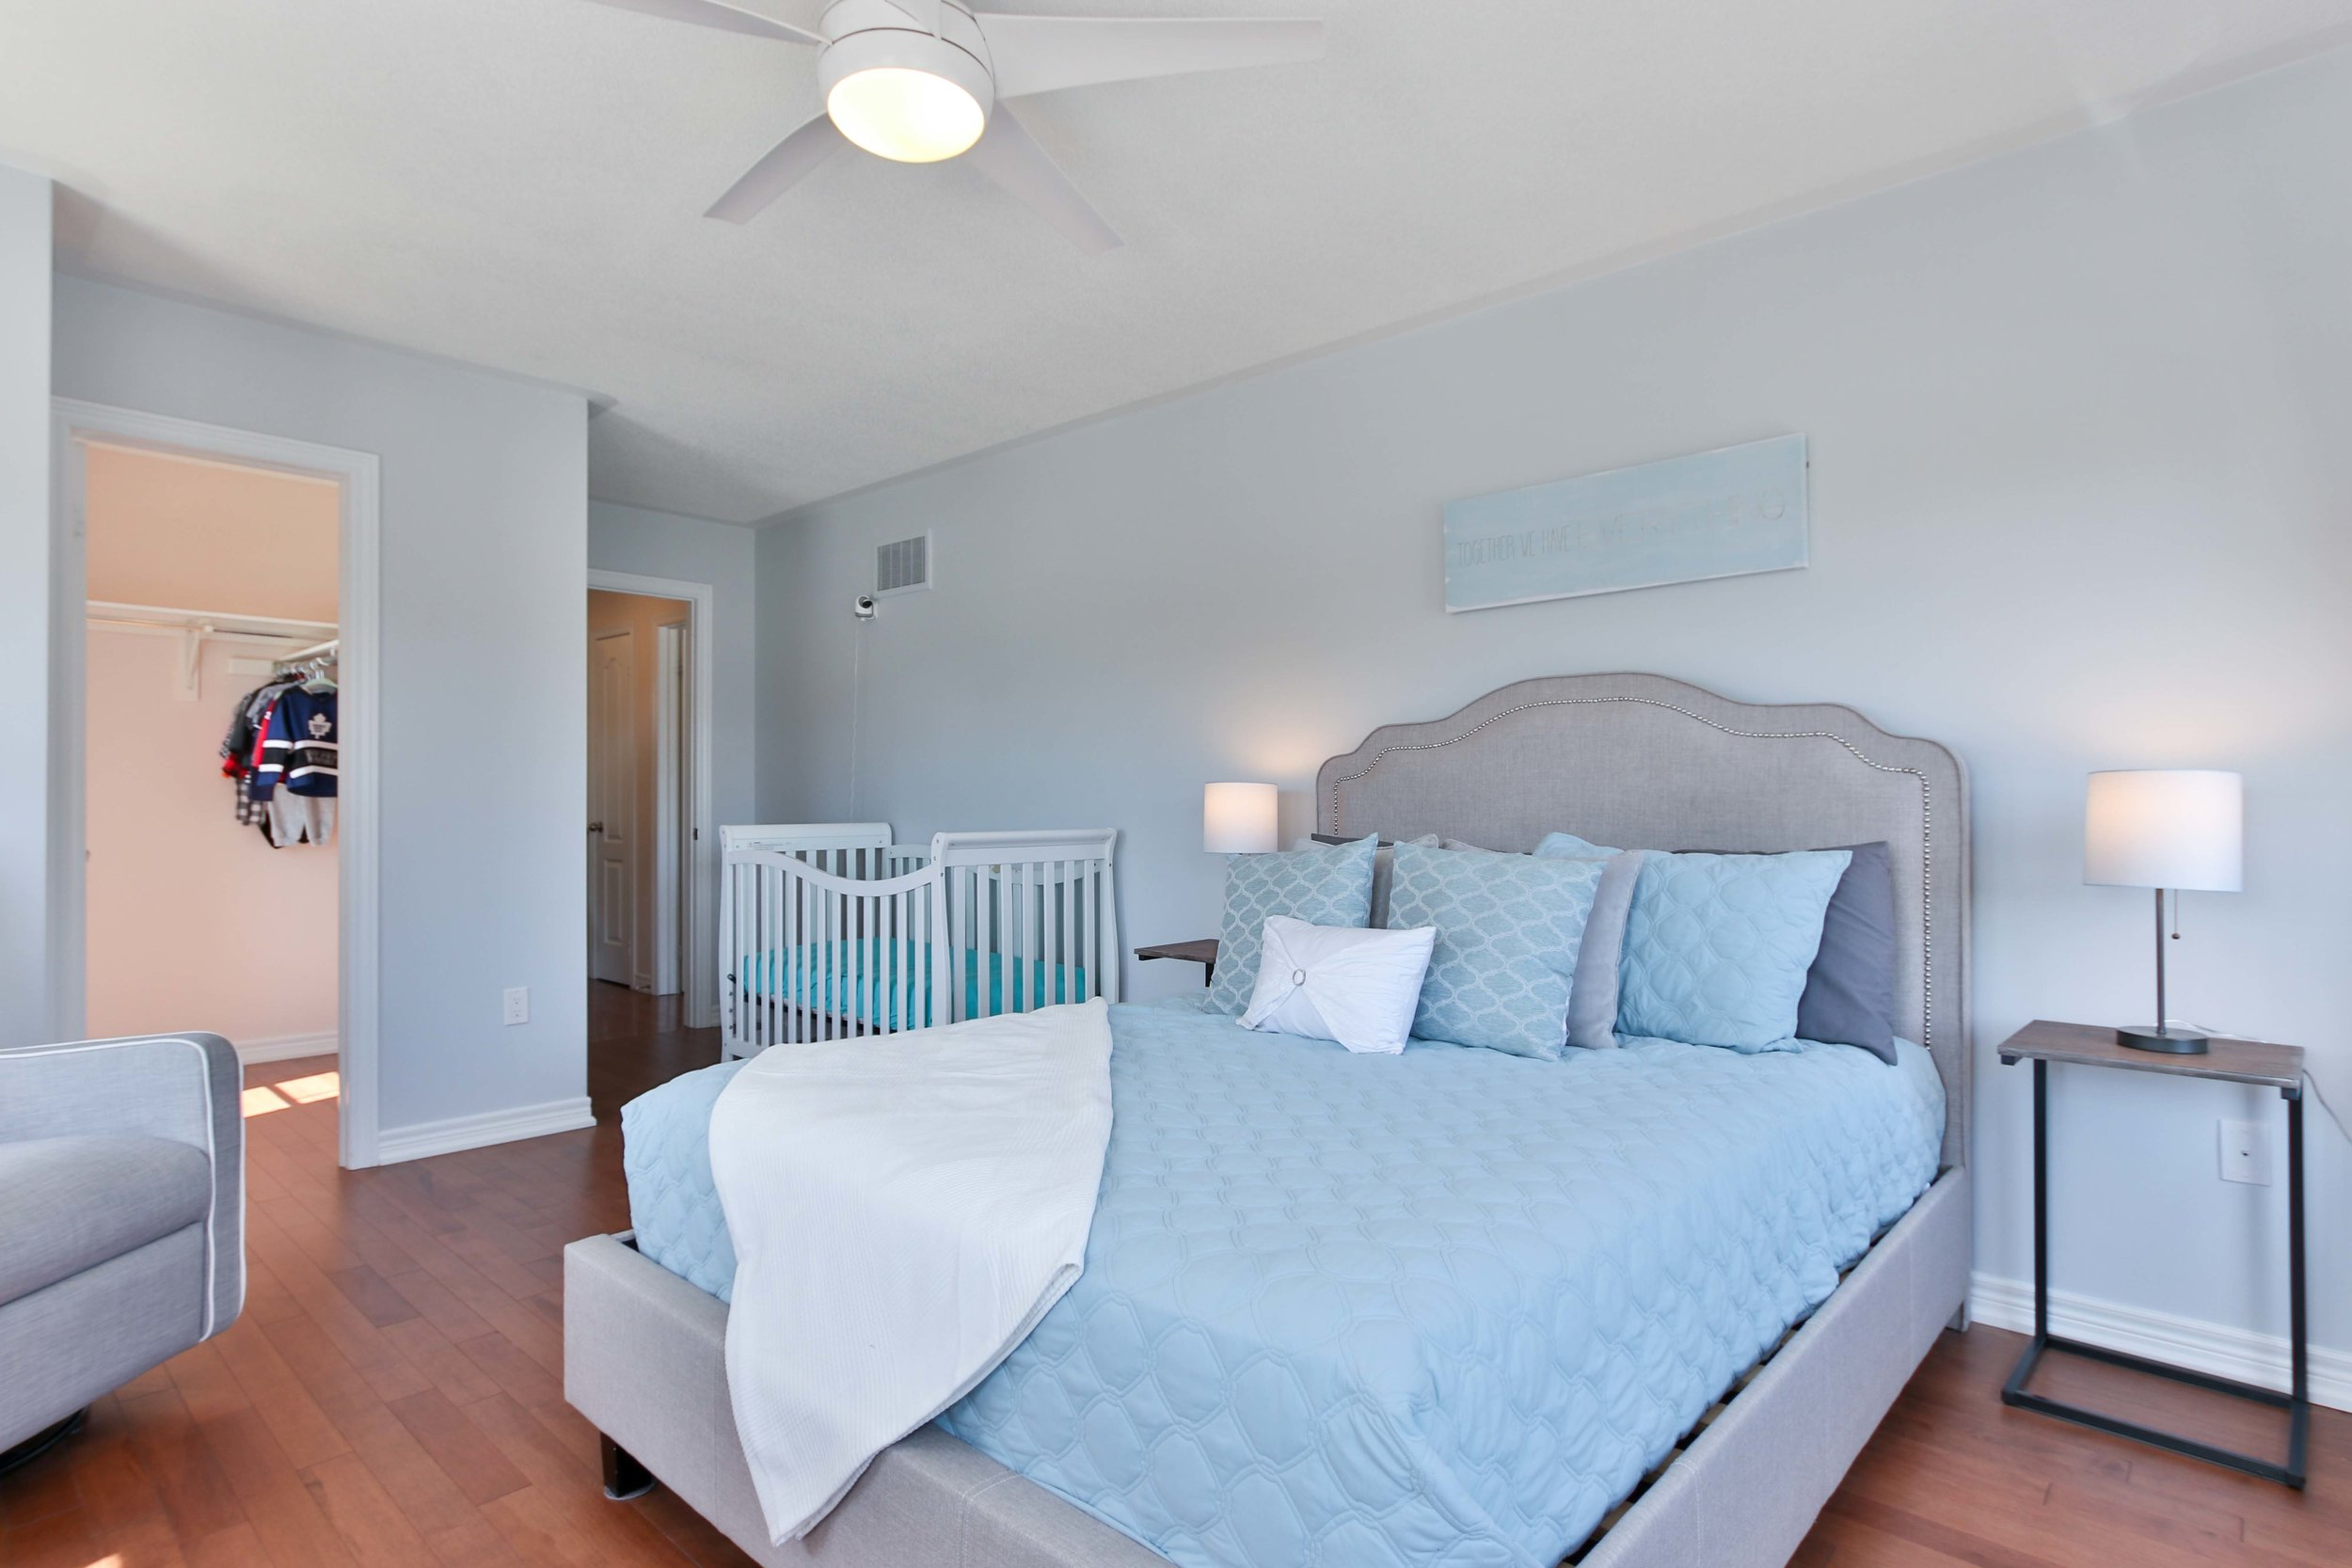 35_Bedroom.jpg